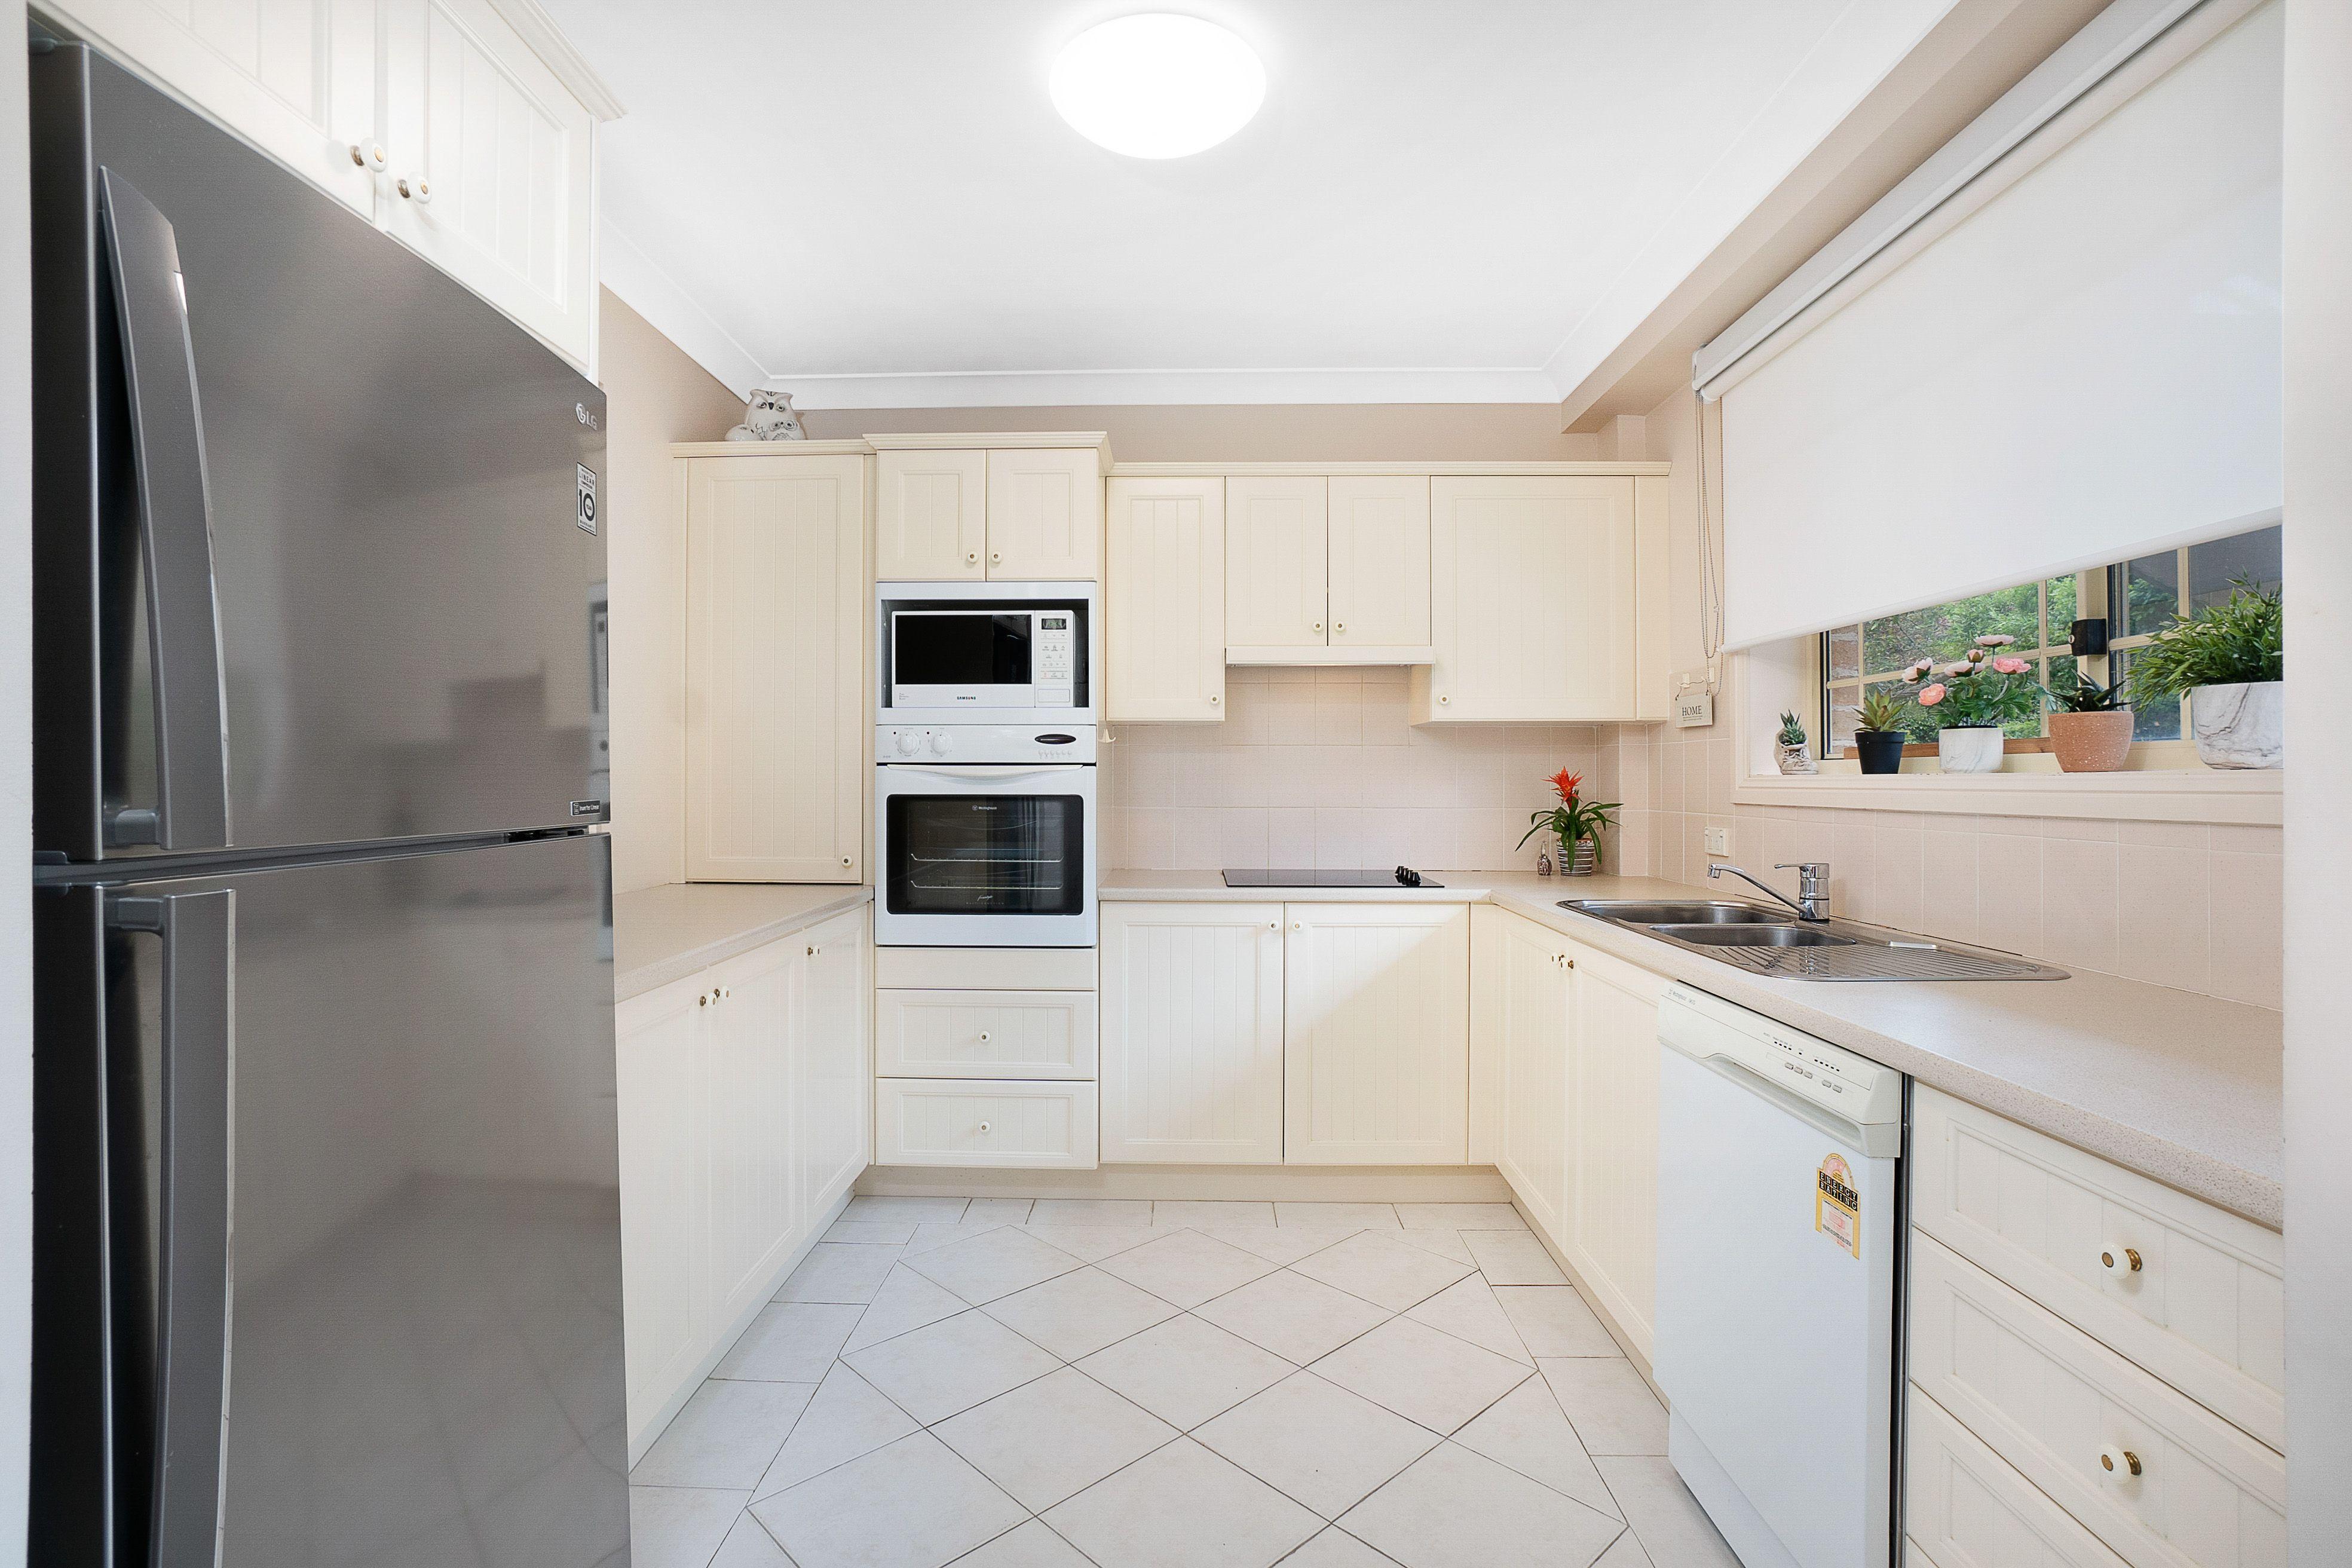 13/3 Stonelea Court, Dural NSW 2158